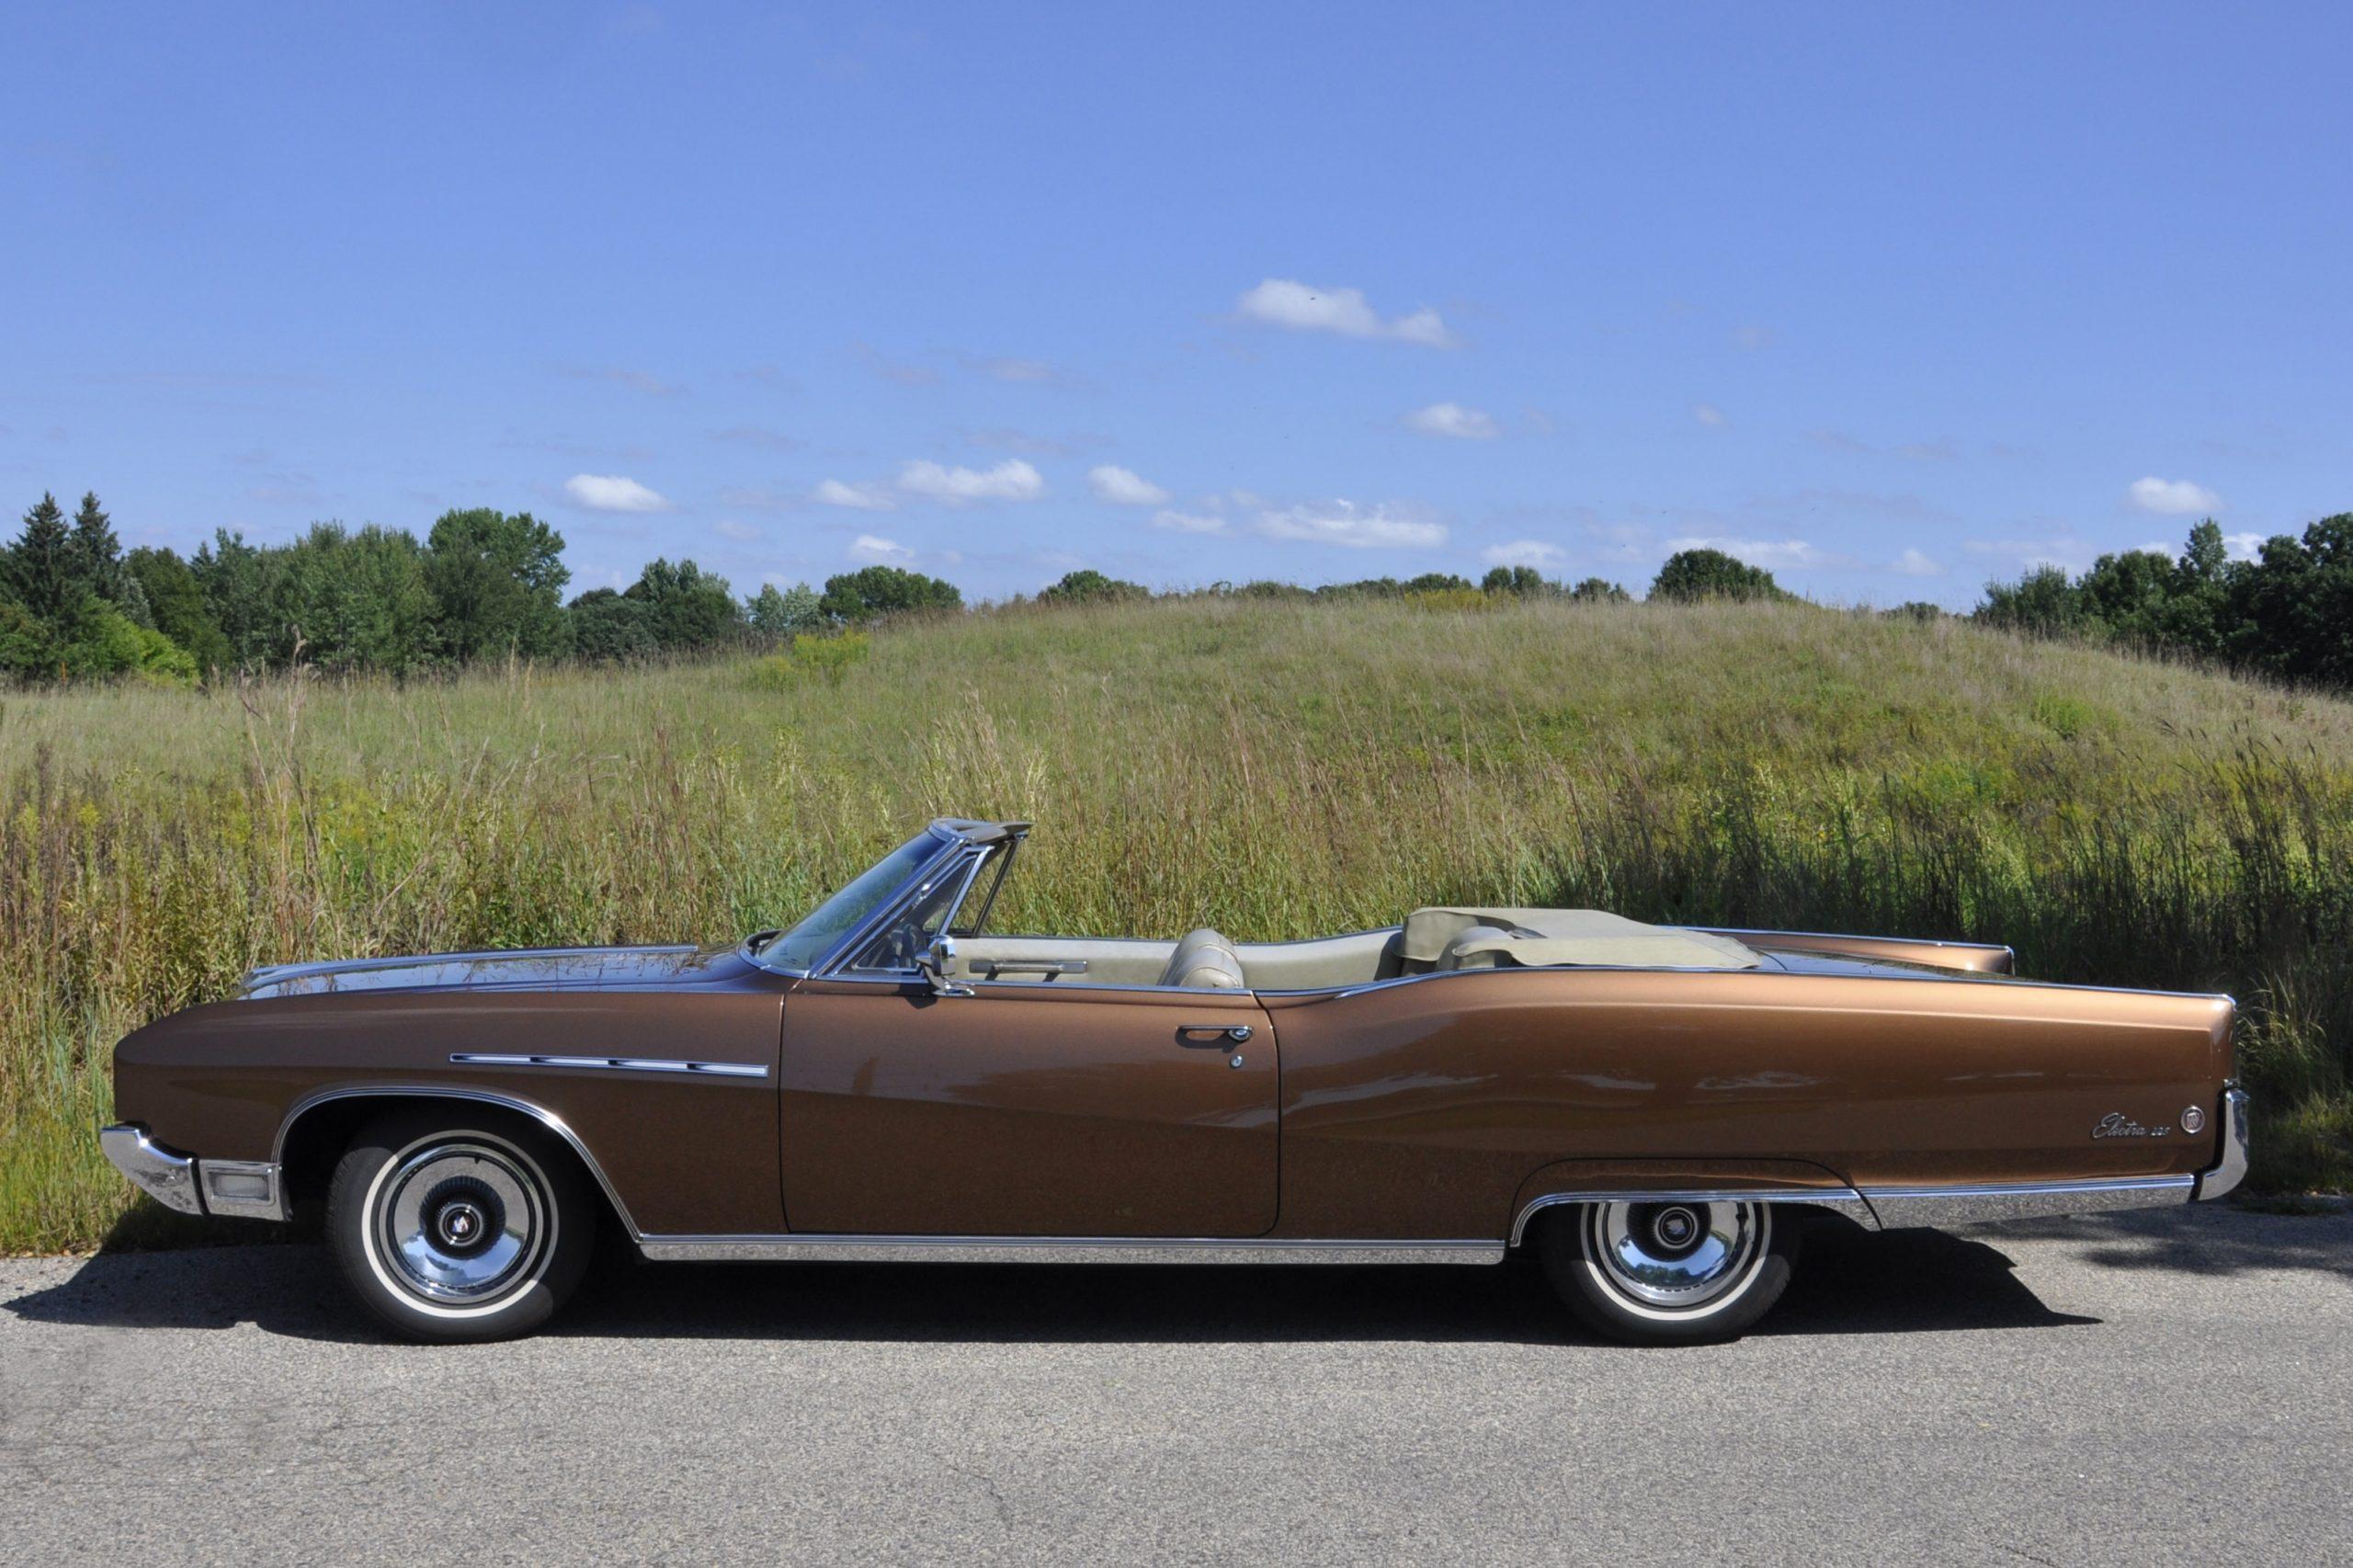 1968 buick electra profile